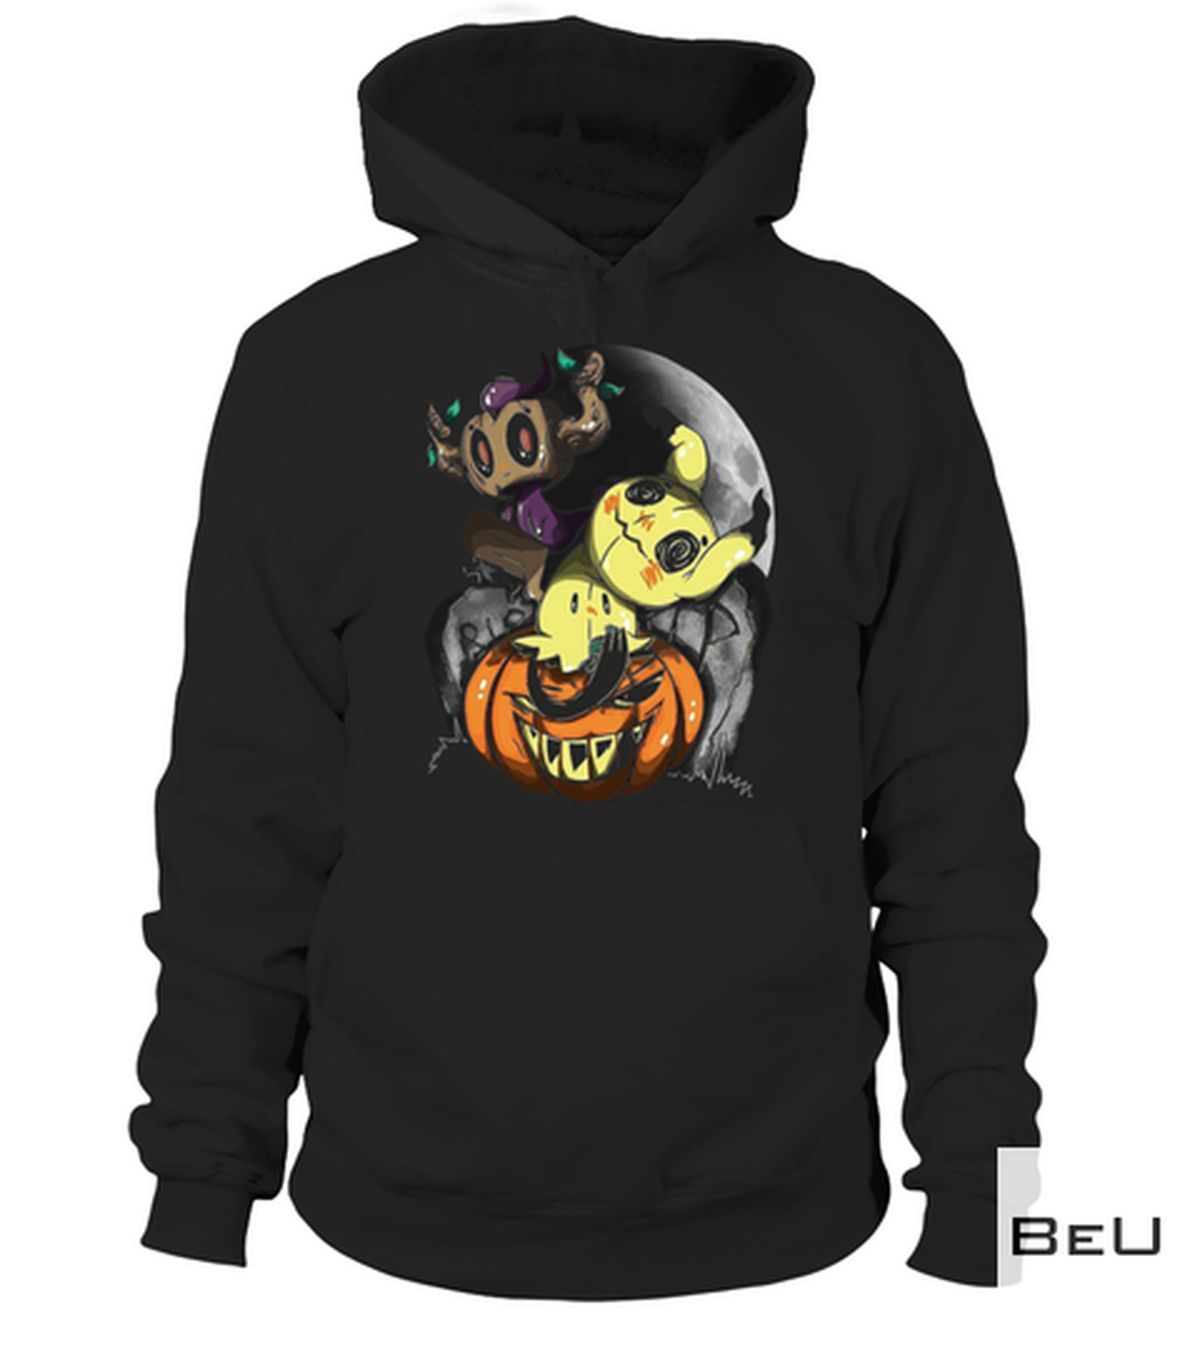 US Shop Creepy Pikachu Pumpkin Halloween Shirt, hoodie, tank top